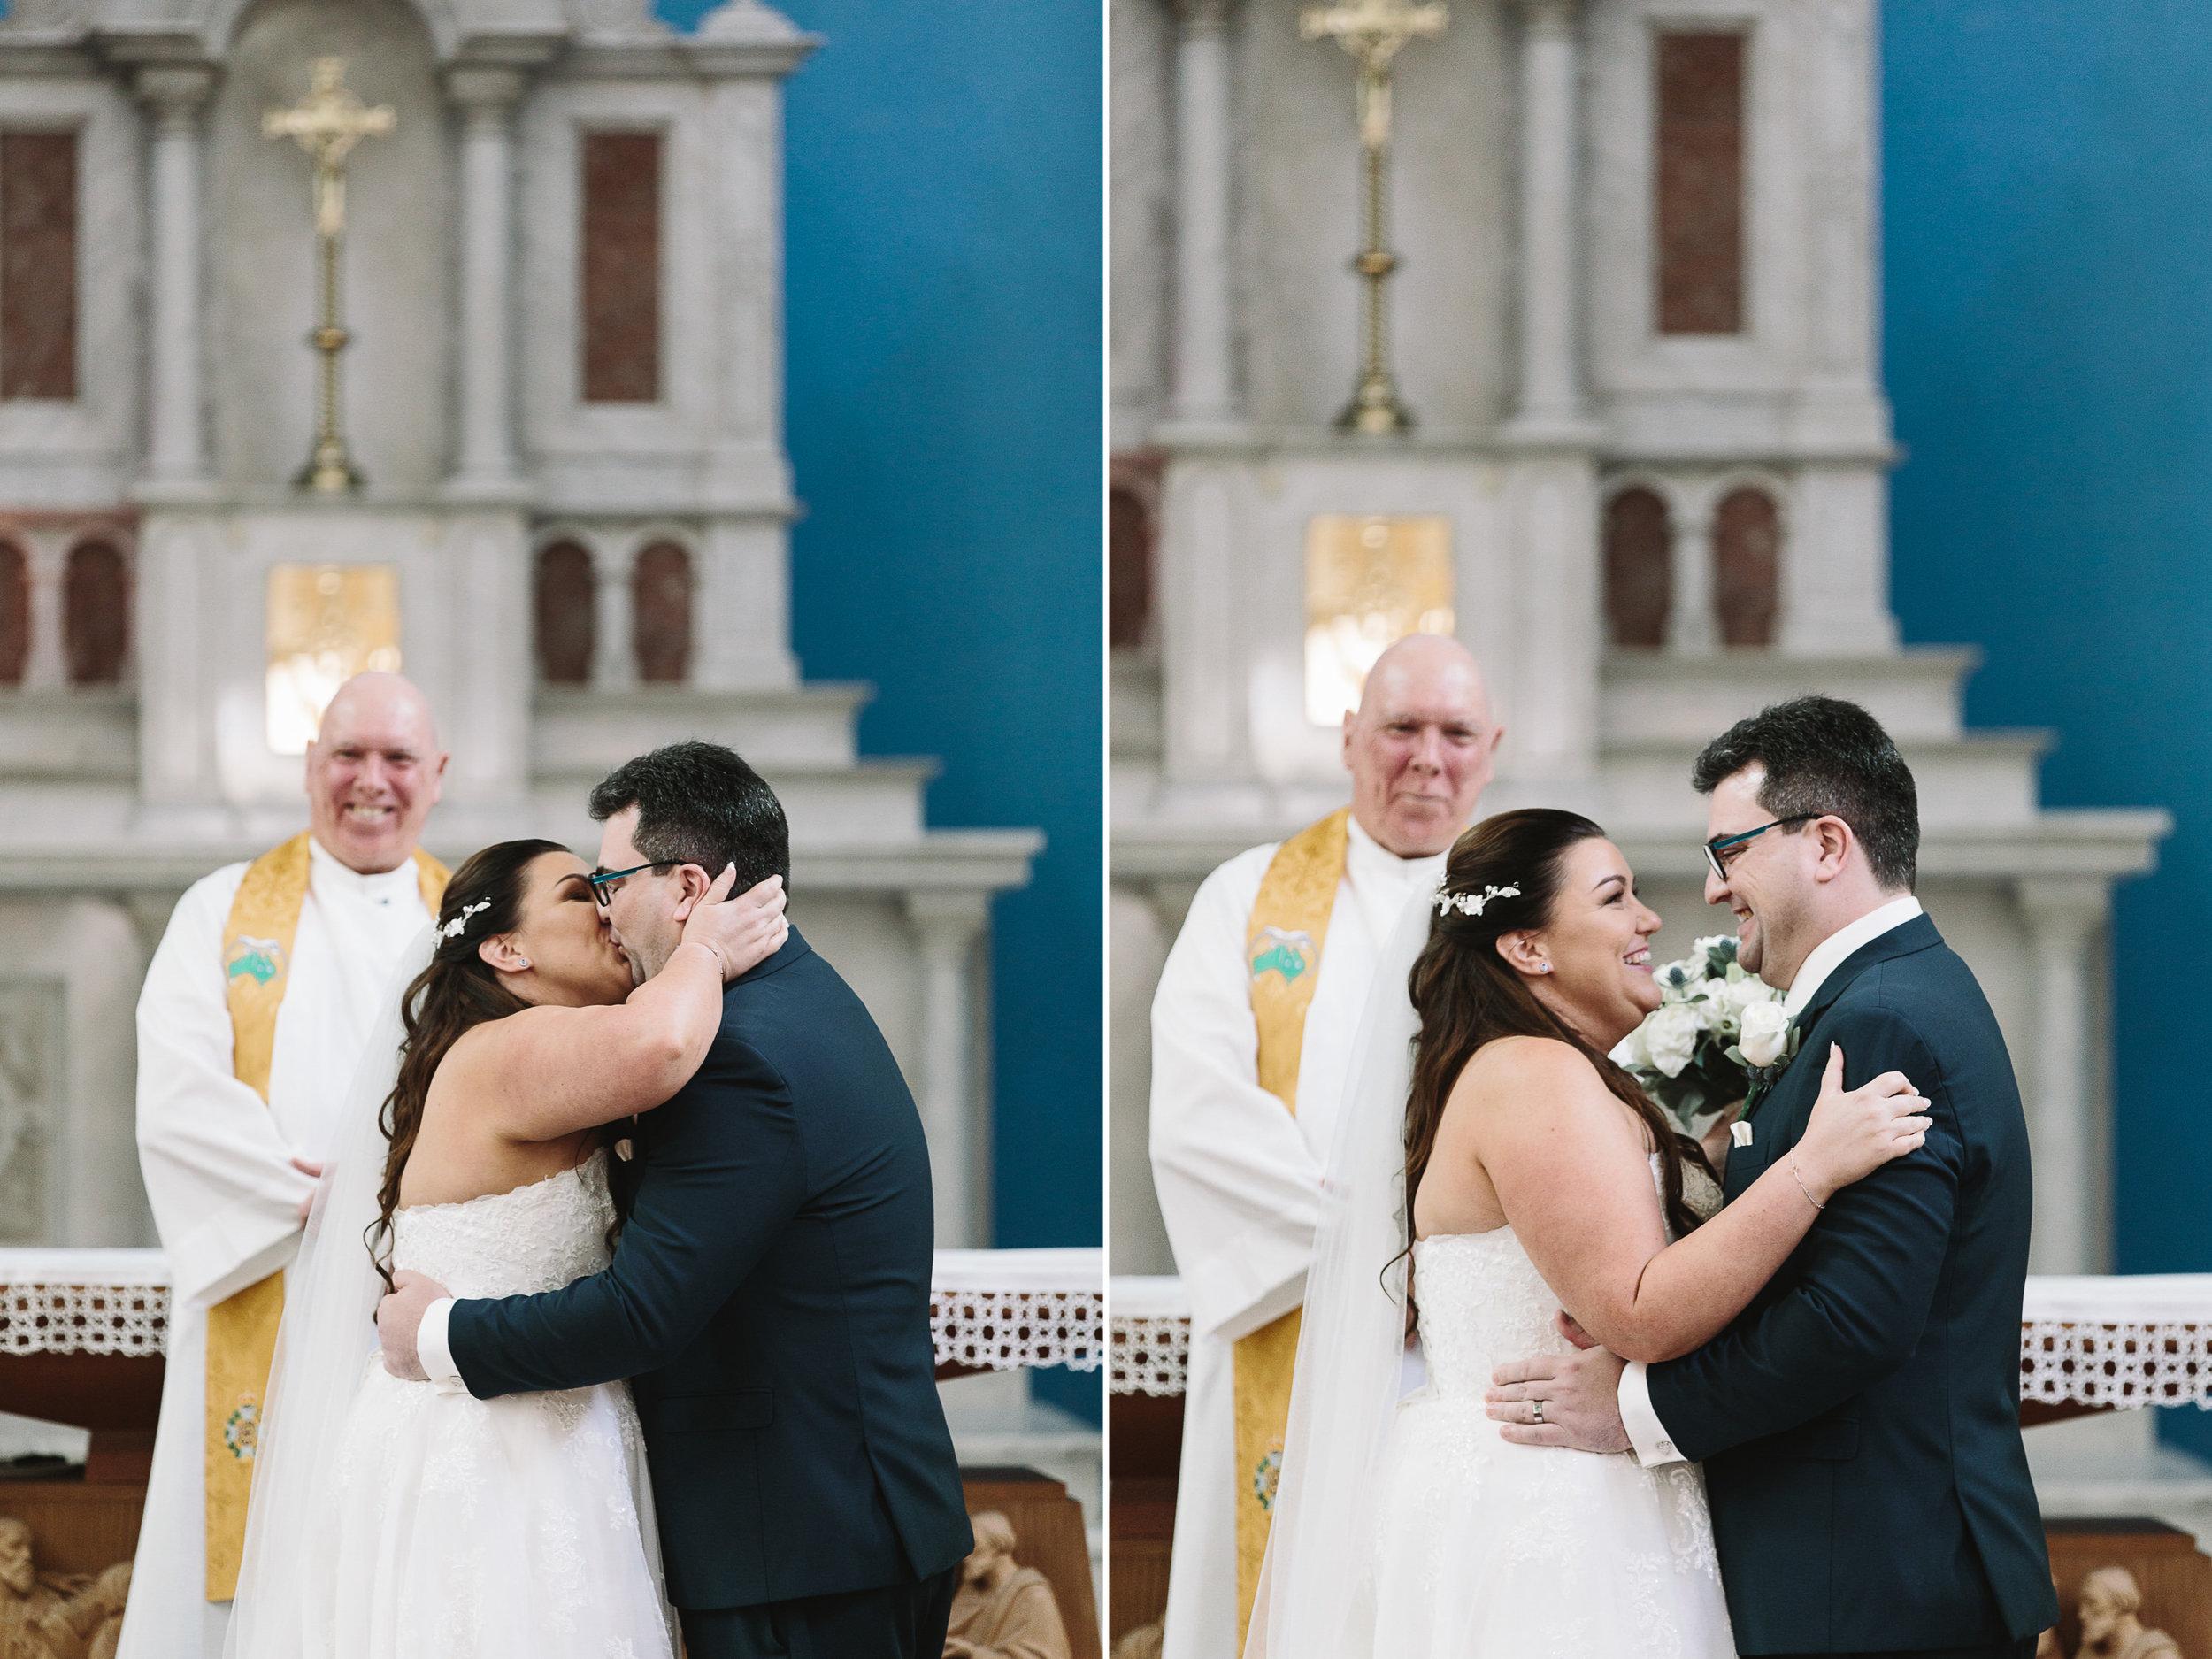 nudgee-college-wedding-24.jpg